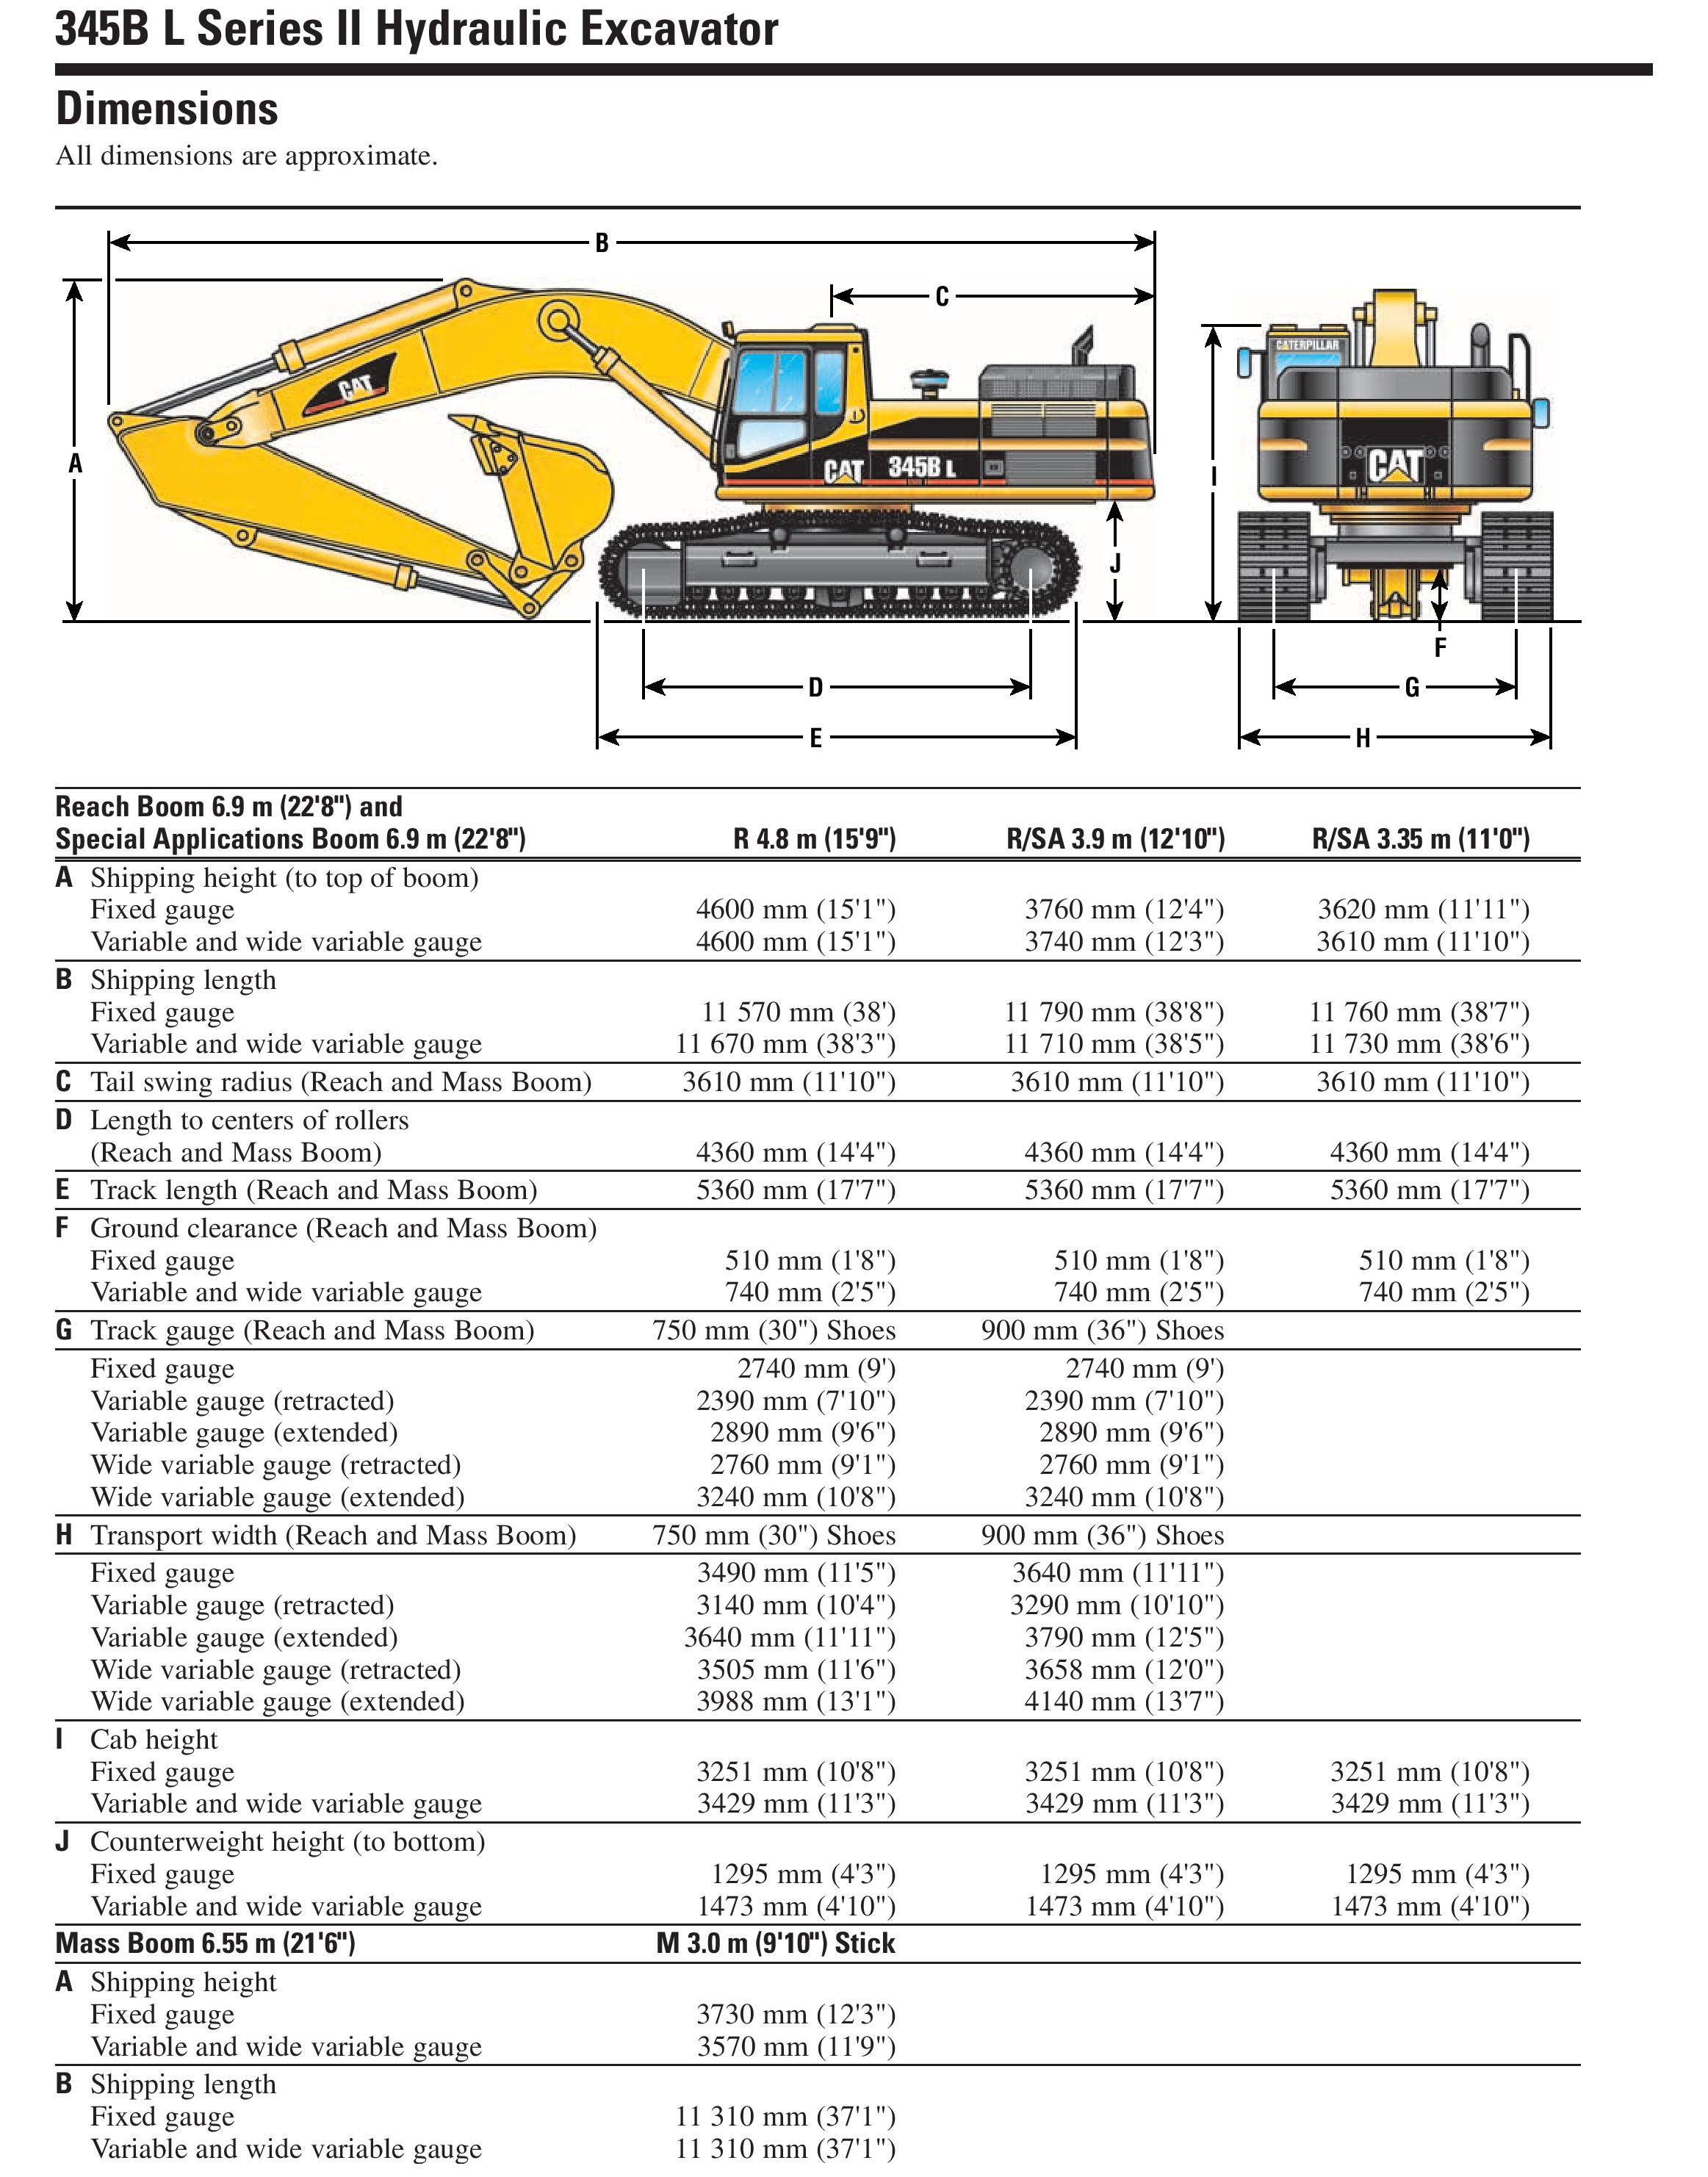 586060 furthermore DaytonMotorMountingLugBracket 3M133 also DaytonShadedPole C FrameMotor 4M077 as well Burton 20logo furthermore Caterpillar 345bl Excavator P130246. on baldor motor specs